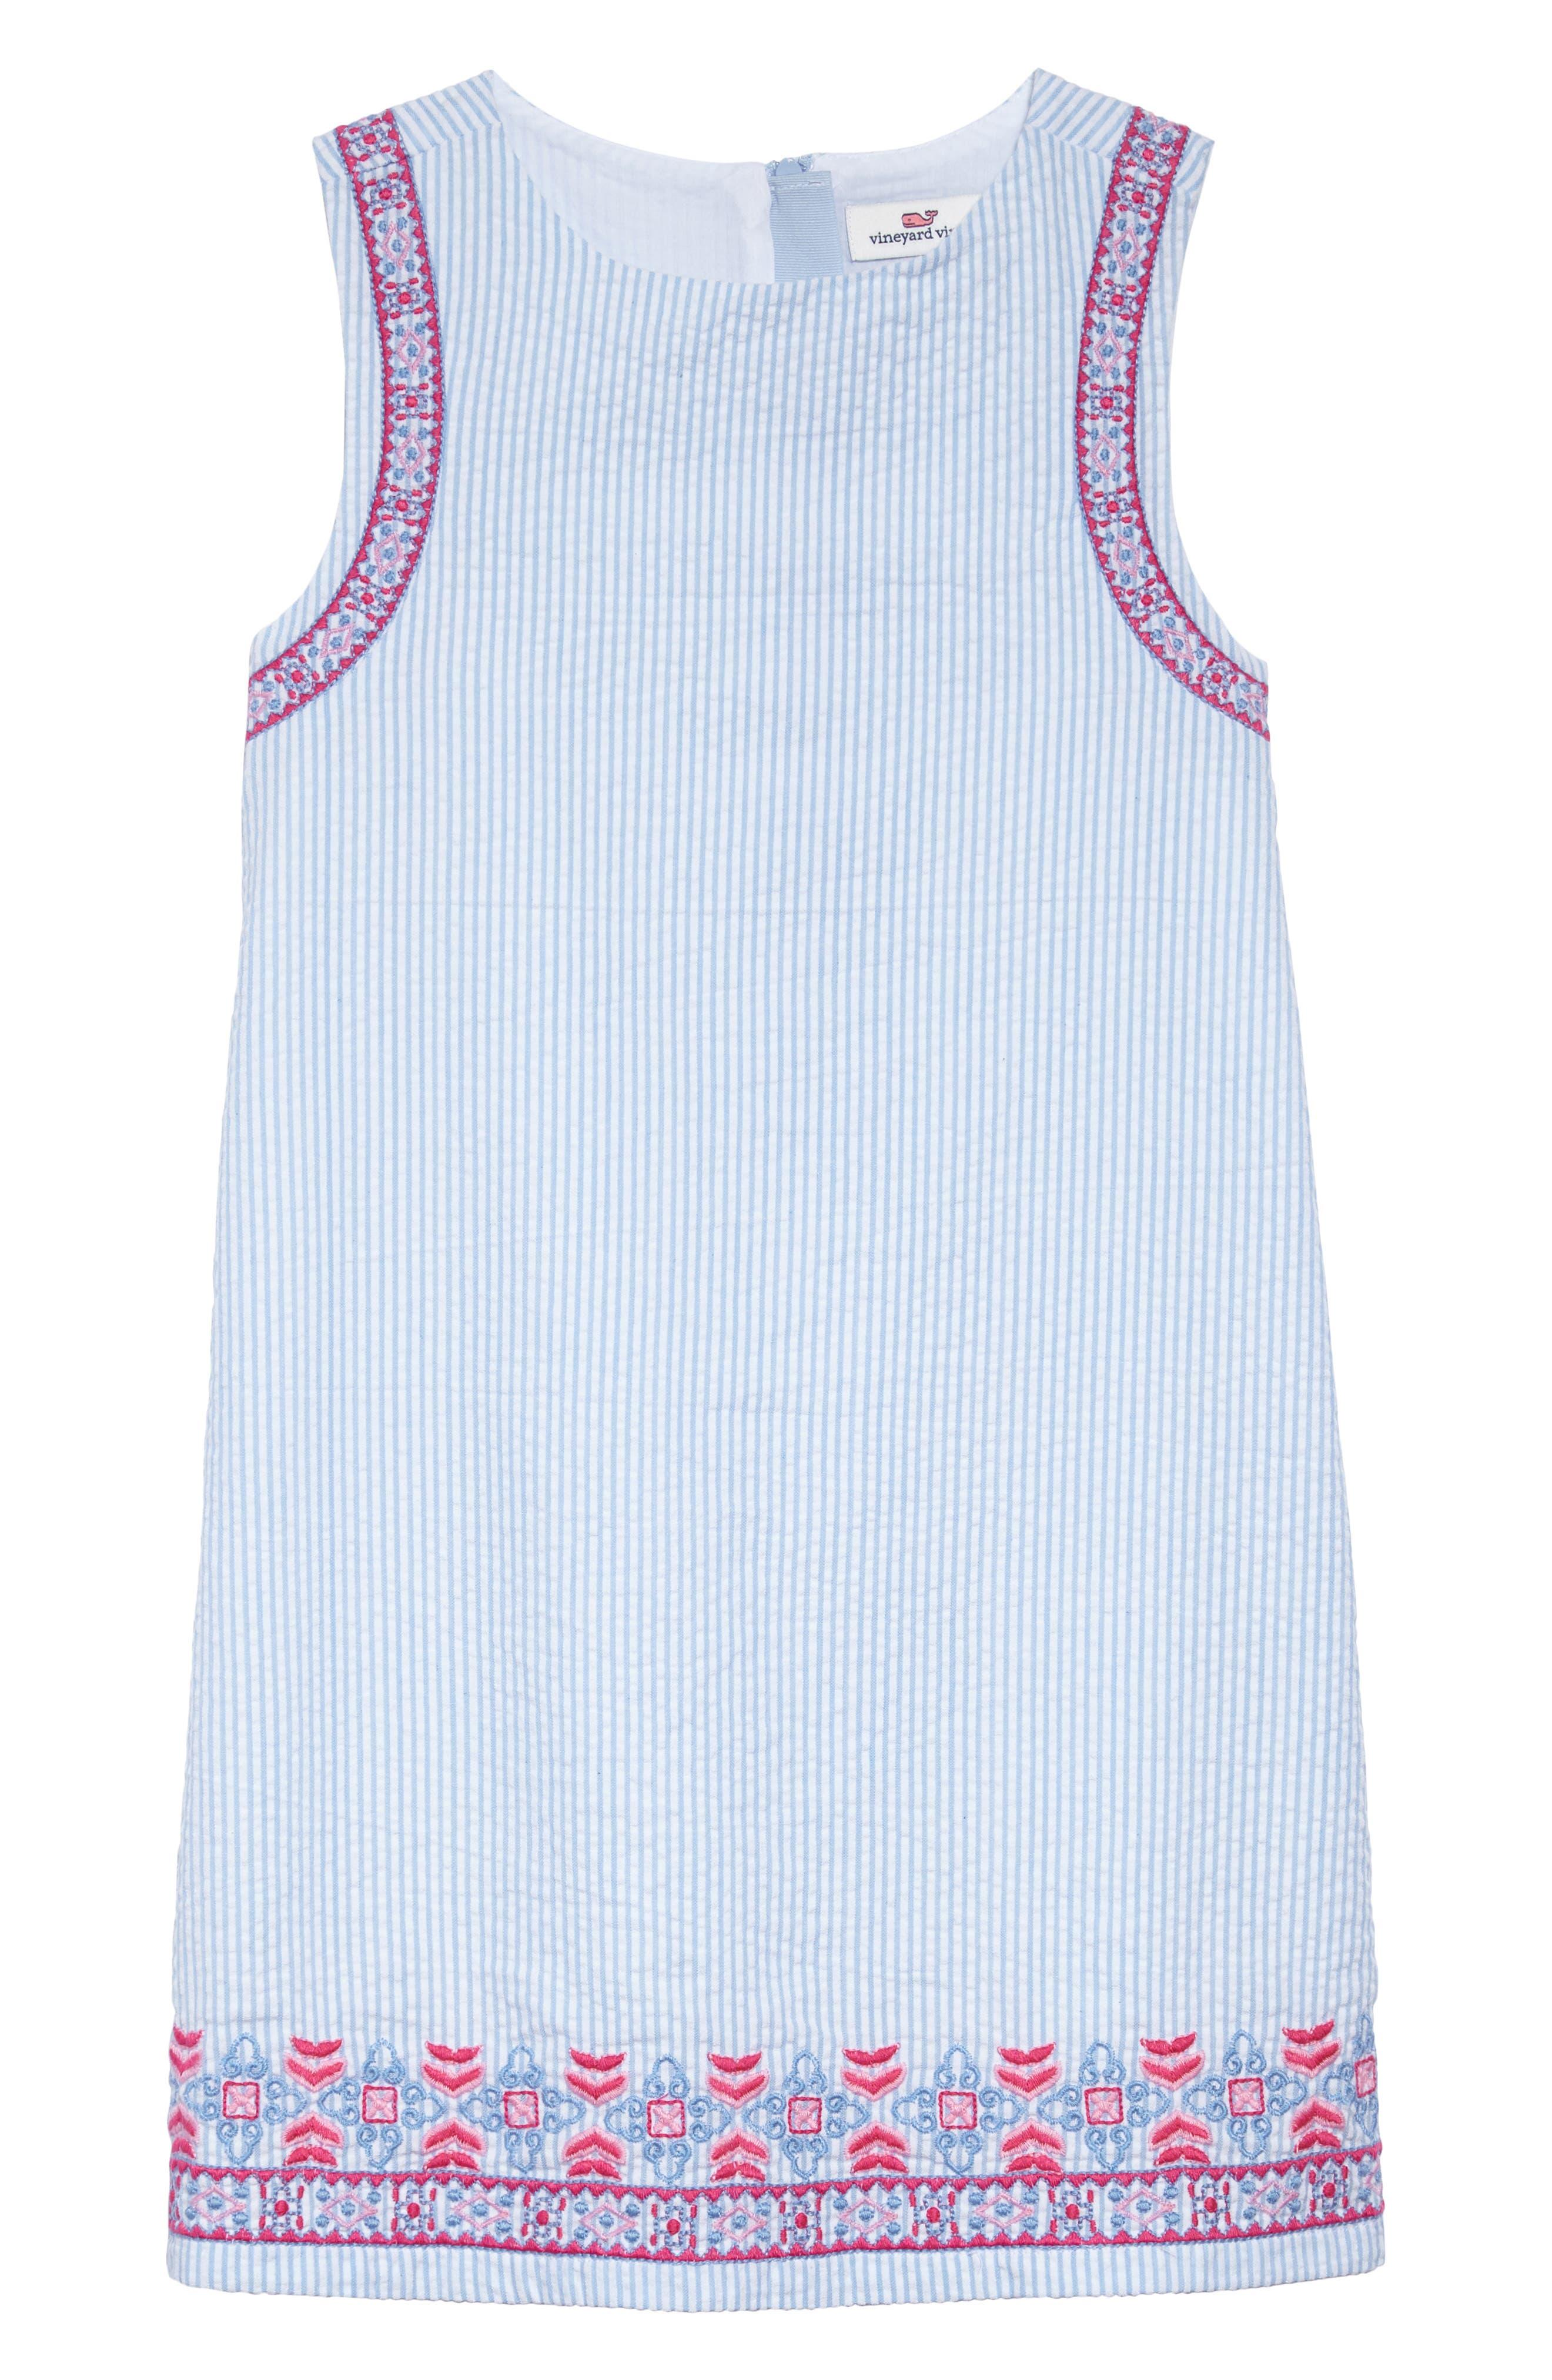 Embroidered Seersucker Shift Dress,                             Main thumbnail 1, color,                             Ocean Breeze